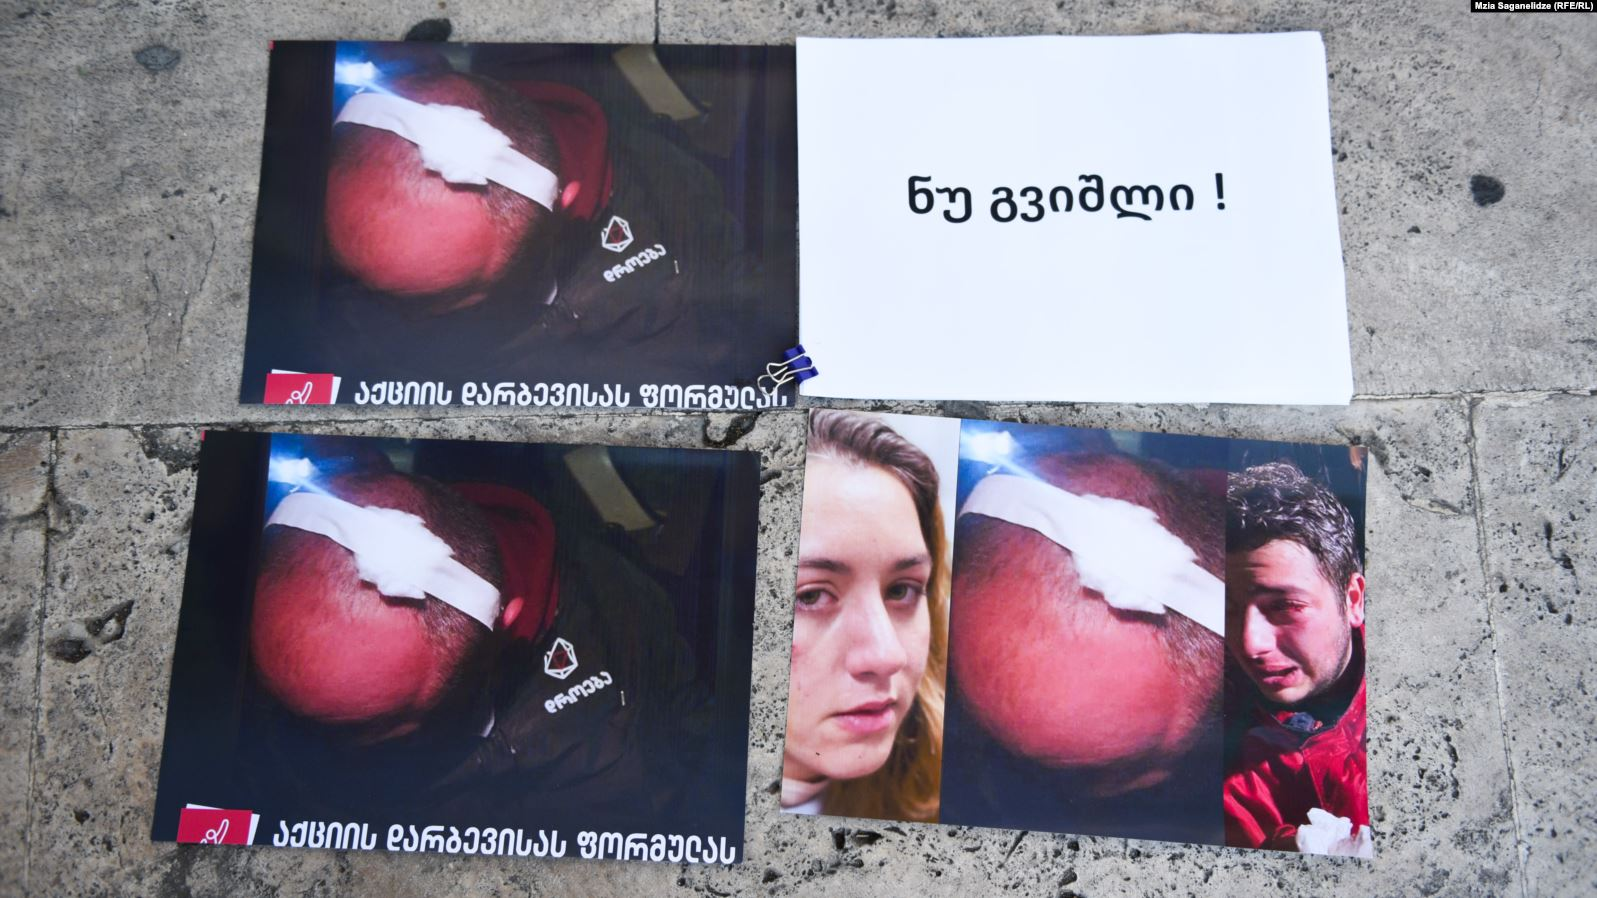 3B1731B9 DD01 4705 BFA9 #новости акция протеста, журналисты, мвд